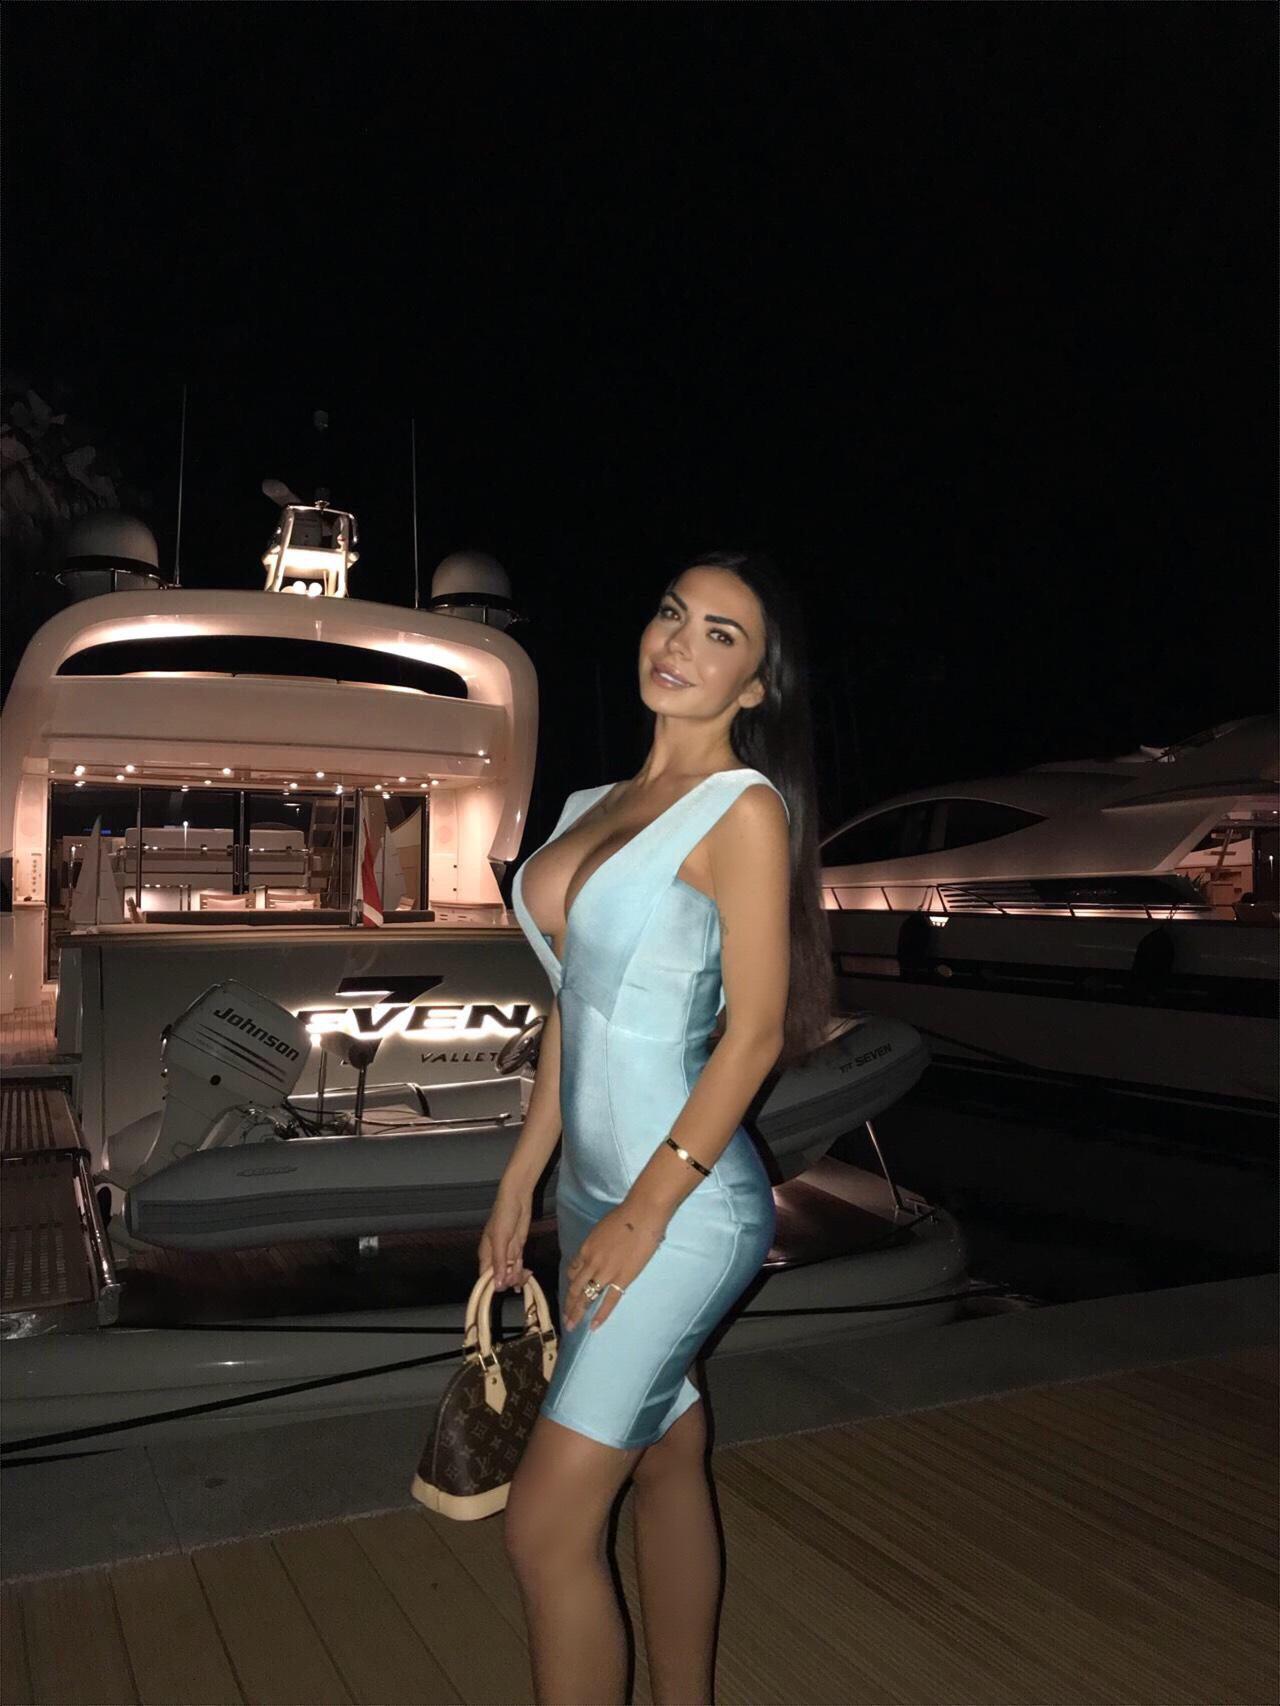 GiuliaNati-CostaSmeralda-Vestito-AcquaMarina-TaccoSwarovski